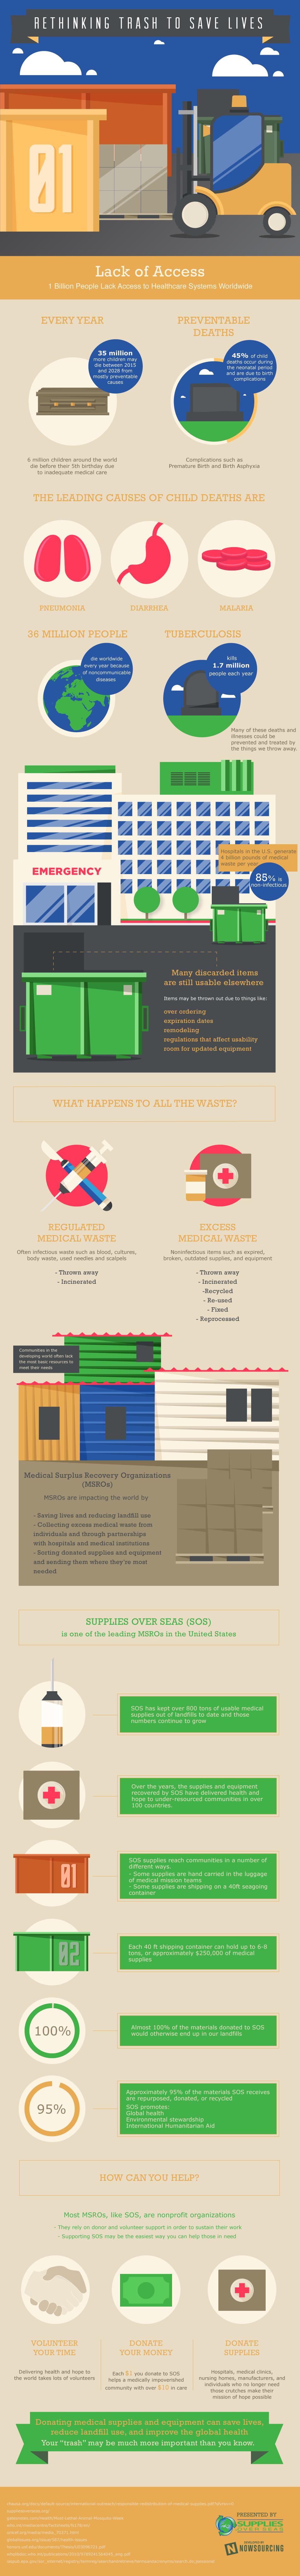 Rethinking Trash To Save Lives